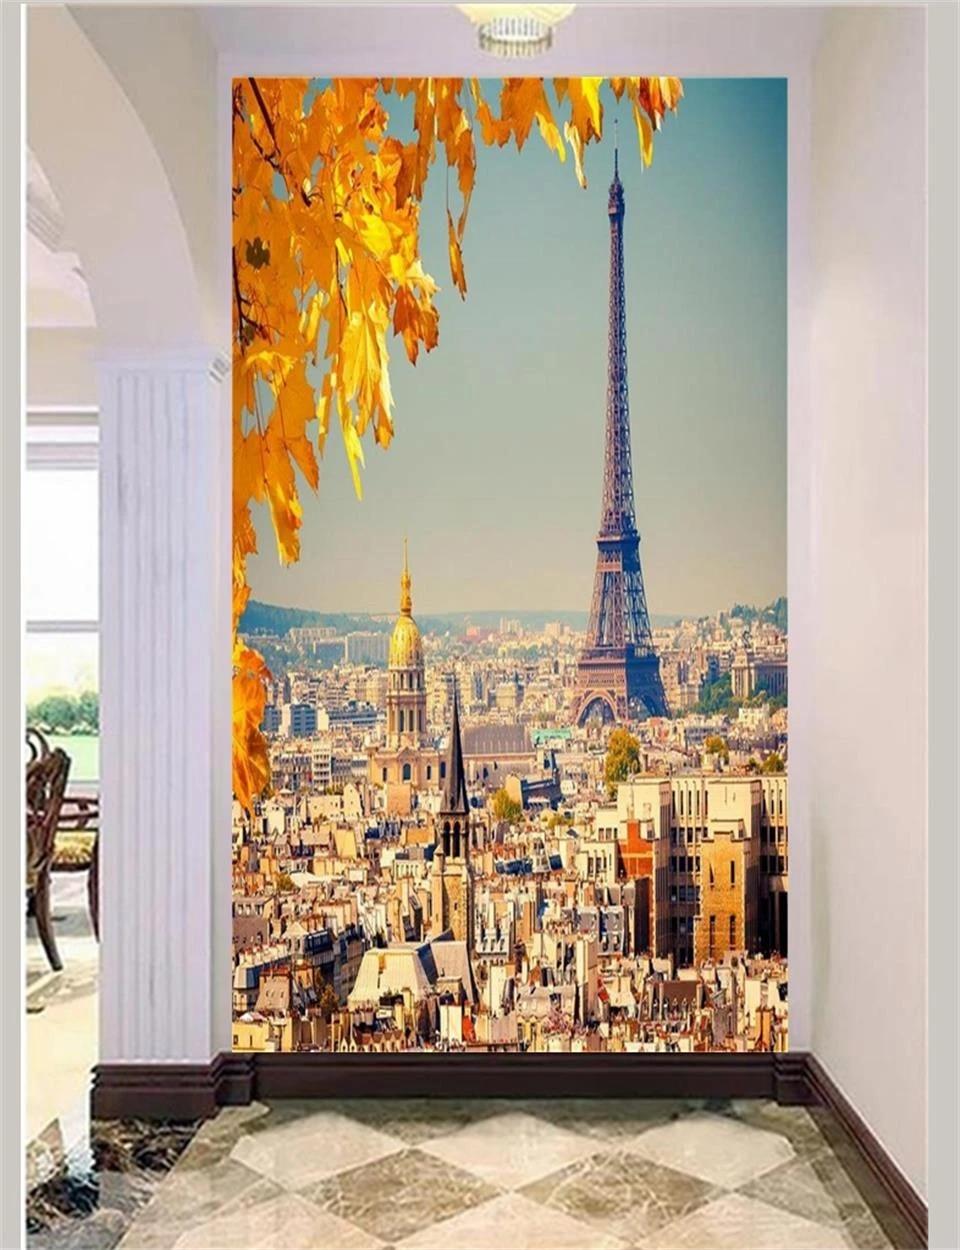 Lukisan Dinding 3d : lukisan, dinding, Wallpaper, Custom, Lukisan, Dinding, Ruang, Teras, Paris, Menara, Eiffel, Pemandangan, 3d|wallpaper, Walls, 3d|3d, Wallpaperphoto, AliExpress